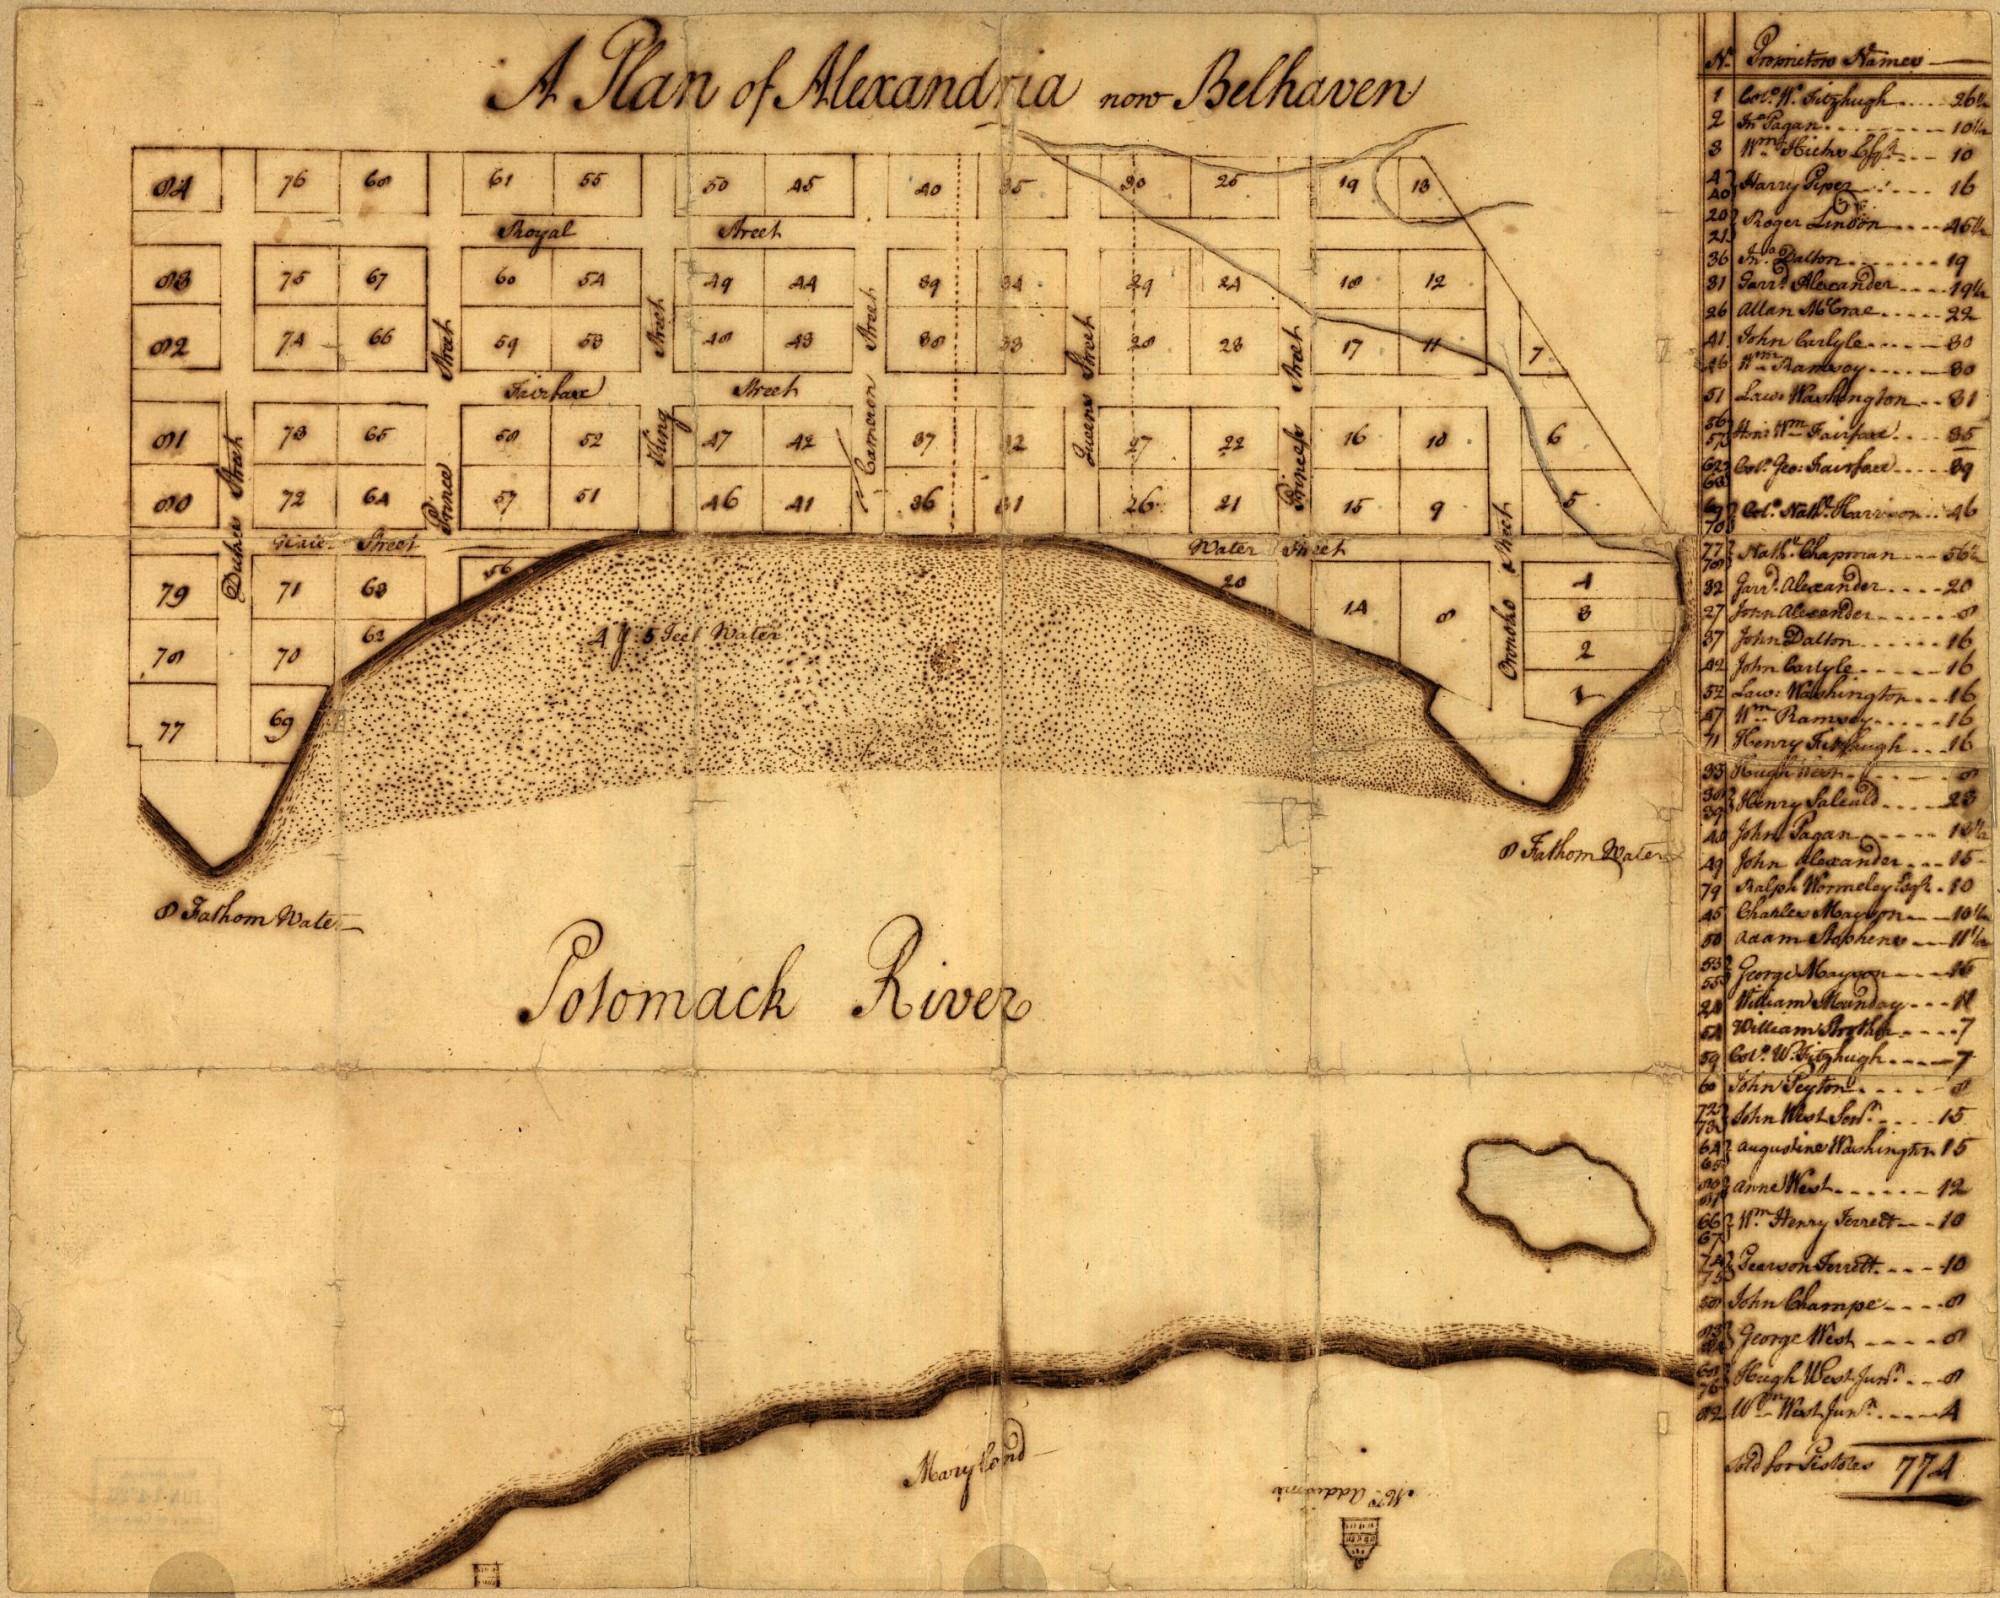 Mt Vernon Washington Map.A Plan Of Alexandria Now Belhaven George Washington S Mount